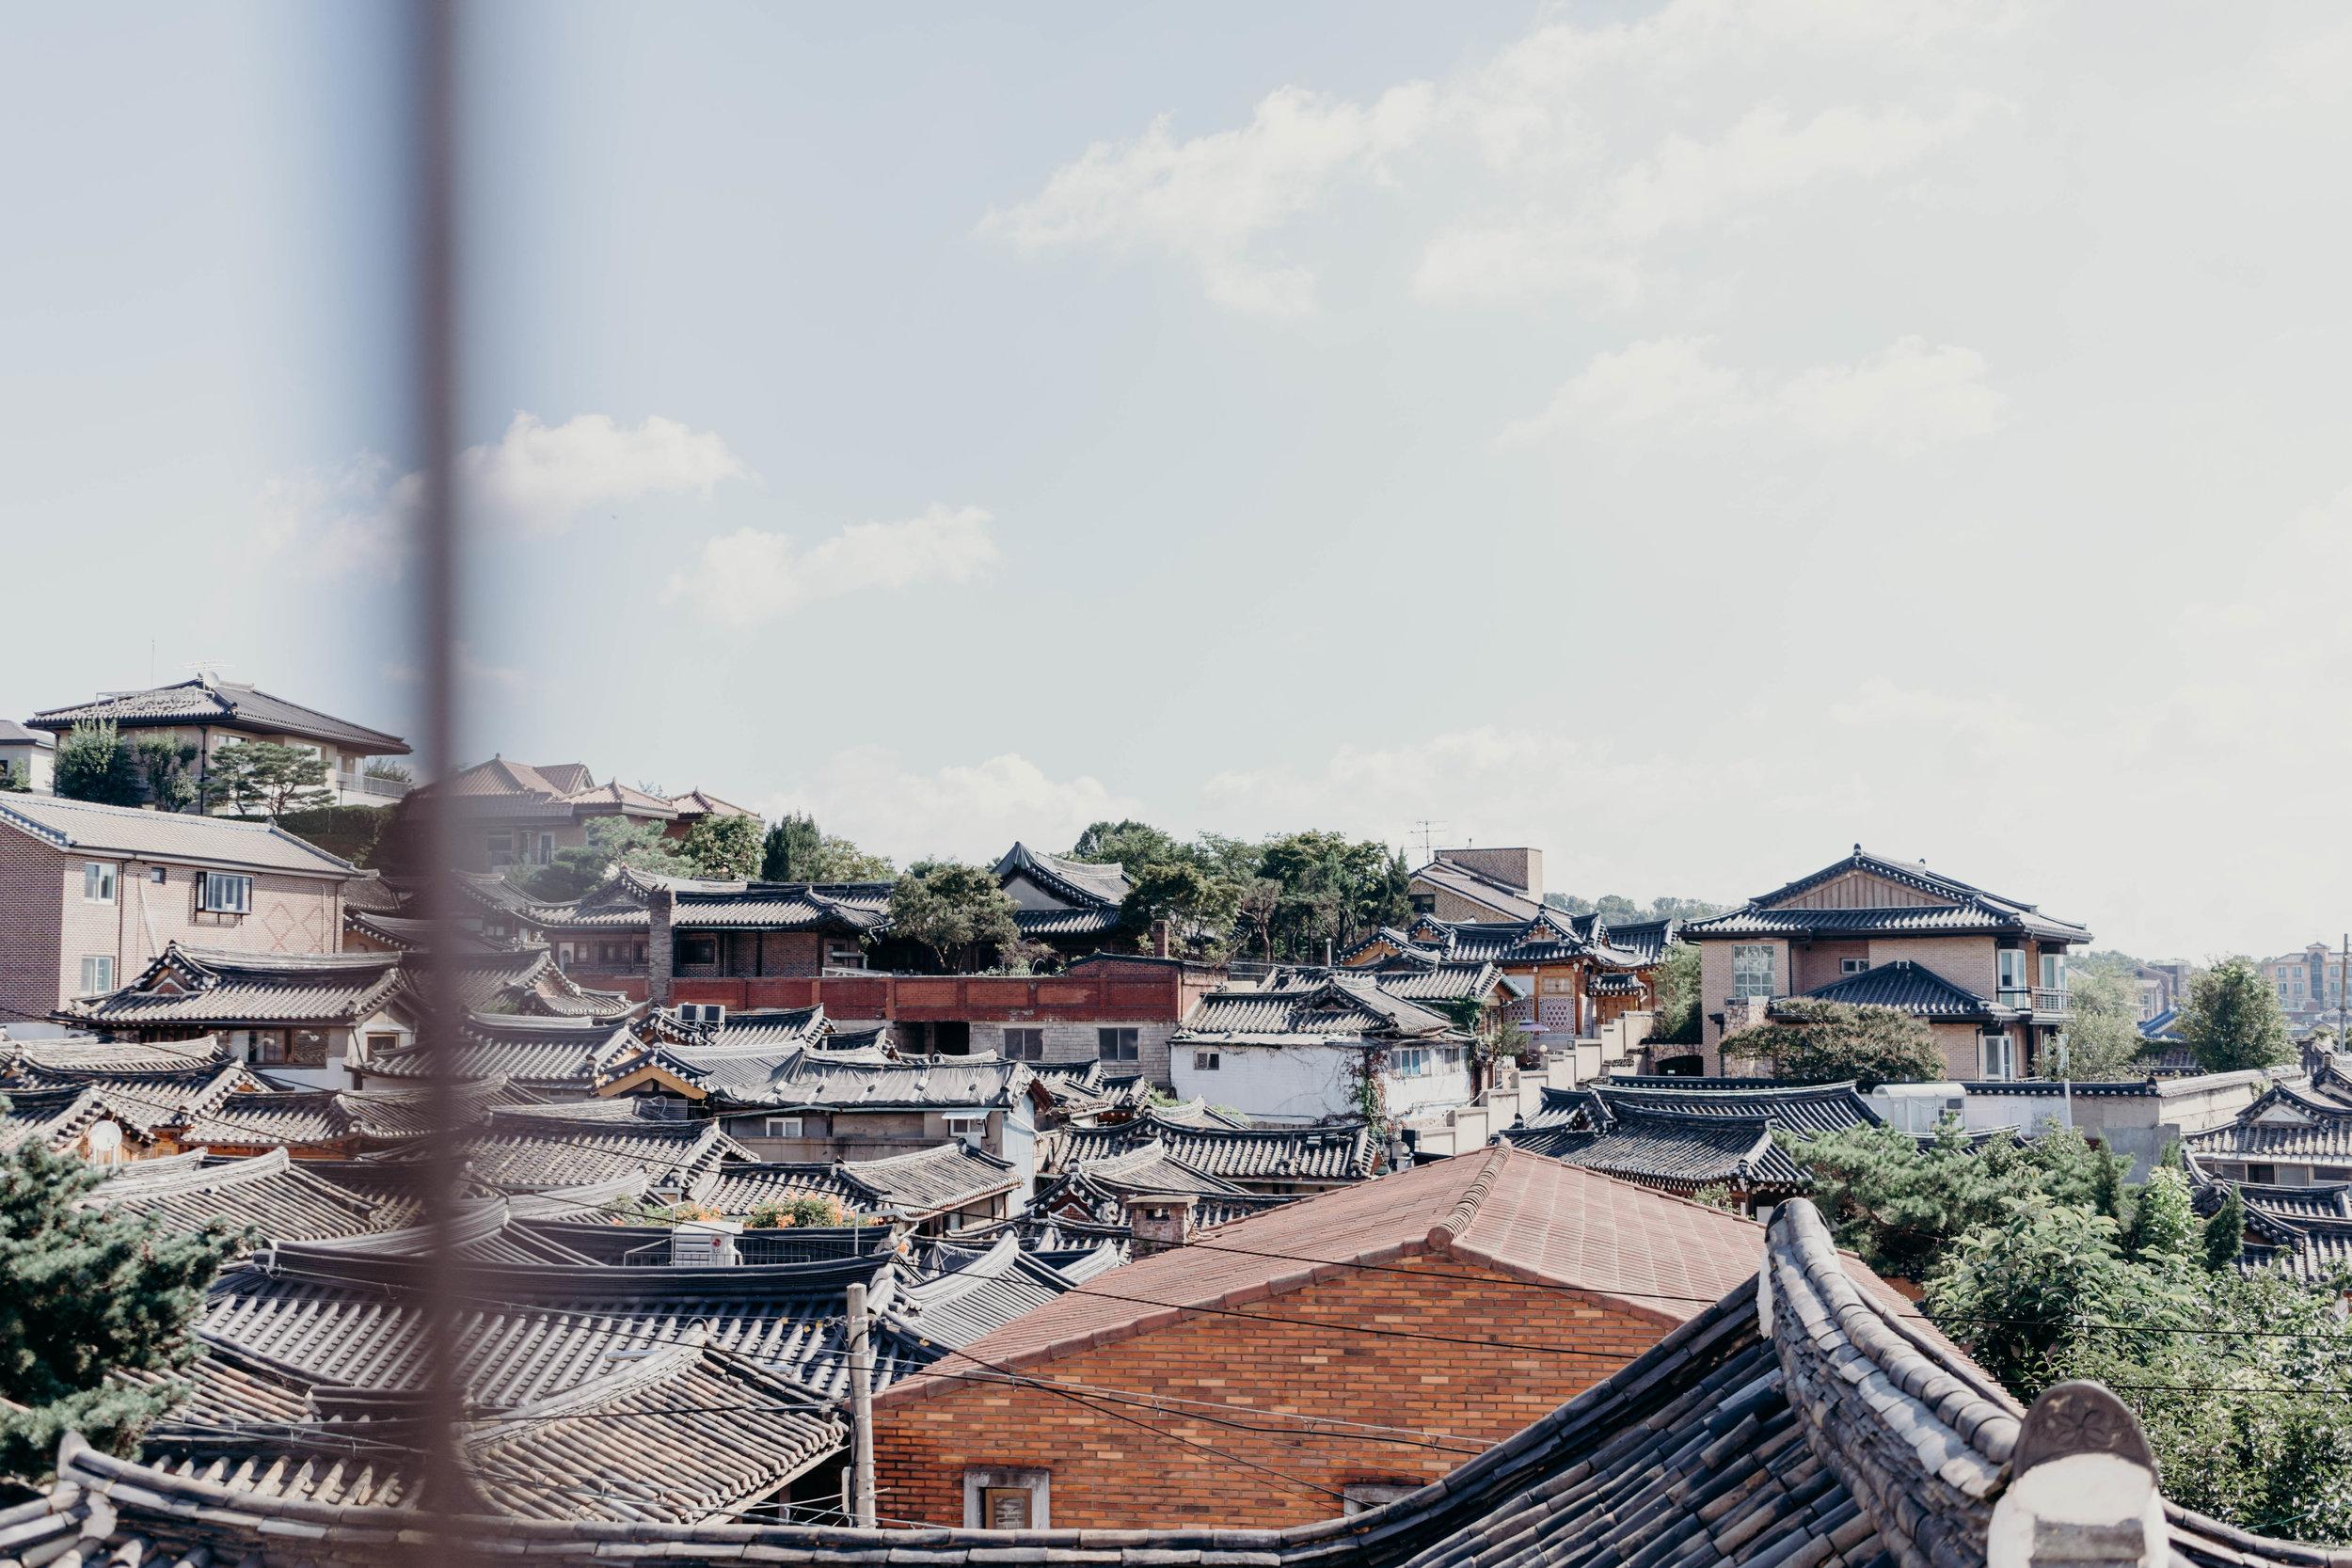 How to Plan Five Days in Seoul | On the Street Where We Live ( aretherelilactrees.com )  hanok, Bukchon Hanok Village, Seoul, South Korea